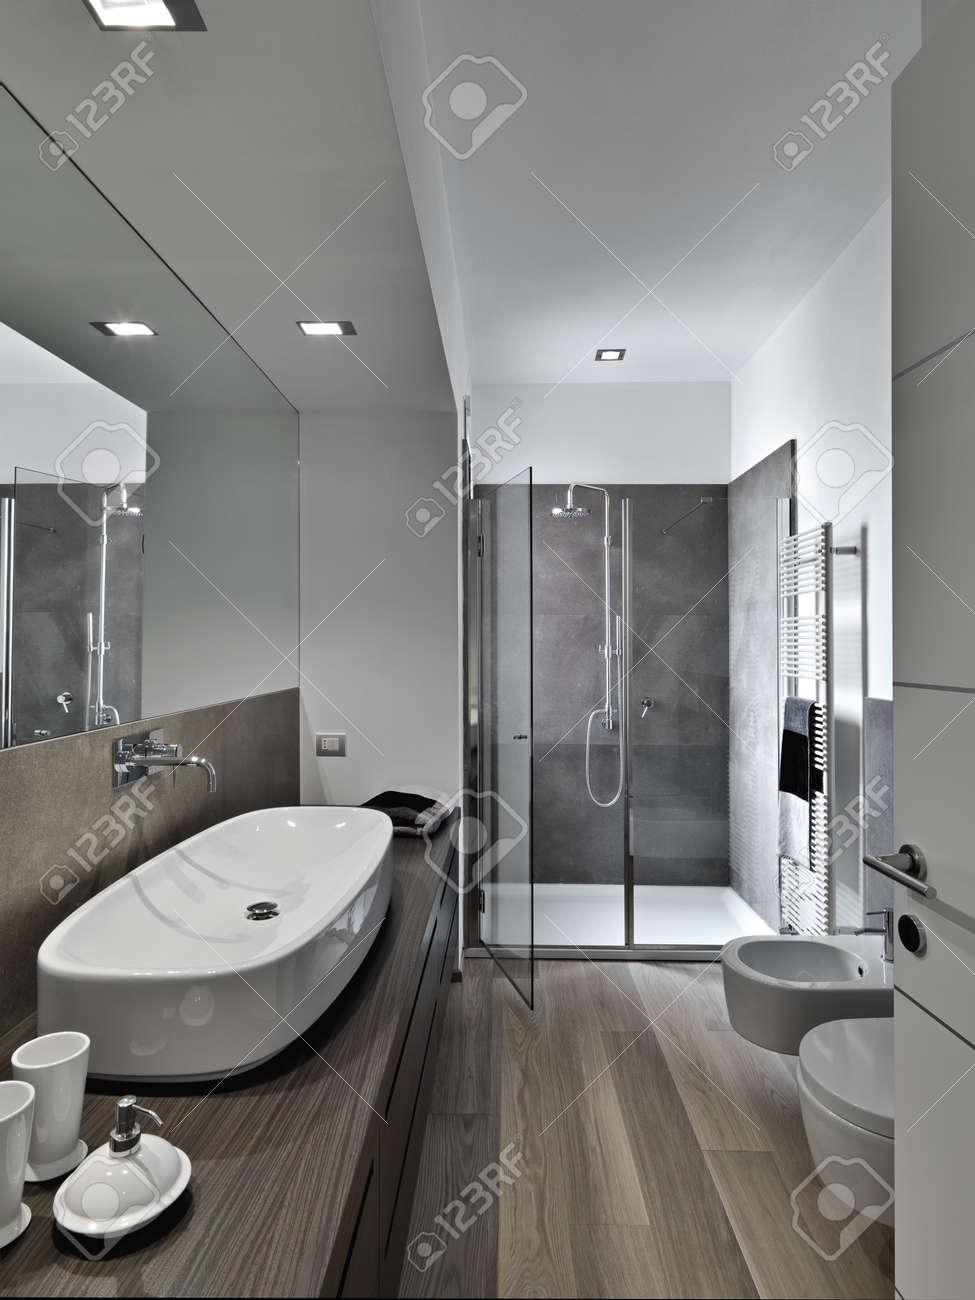 shower cubicle and washbasin a modern bathroom Standard-Bild - 18264647